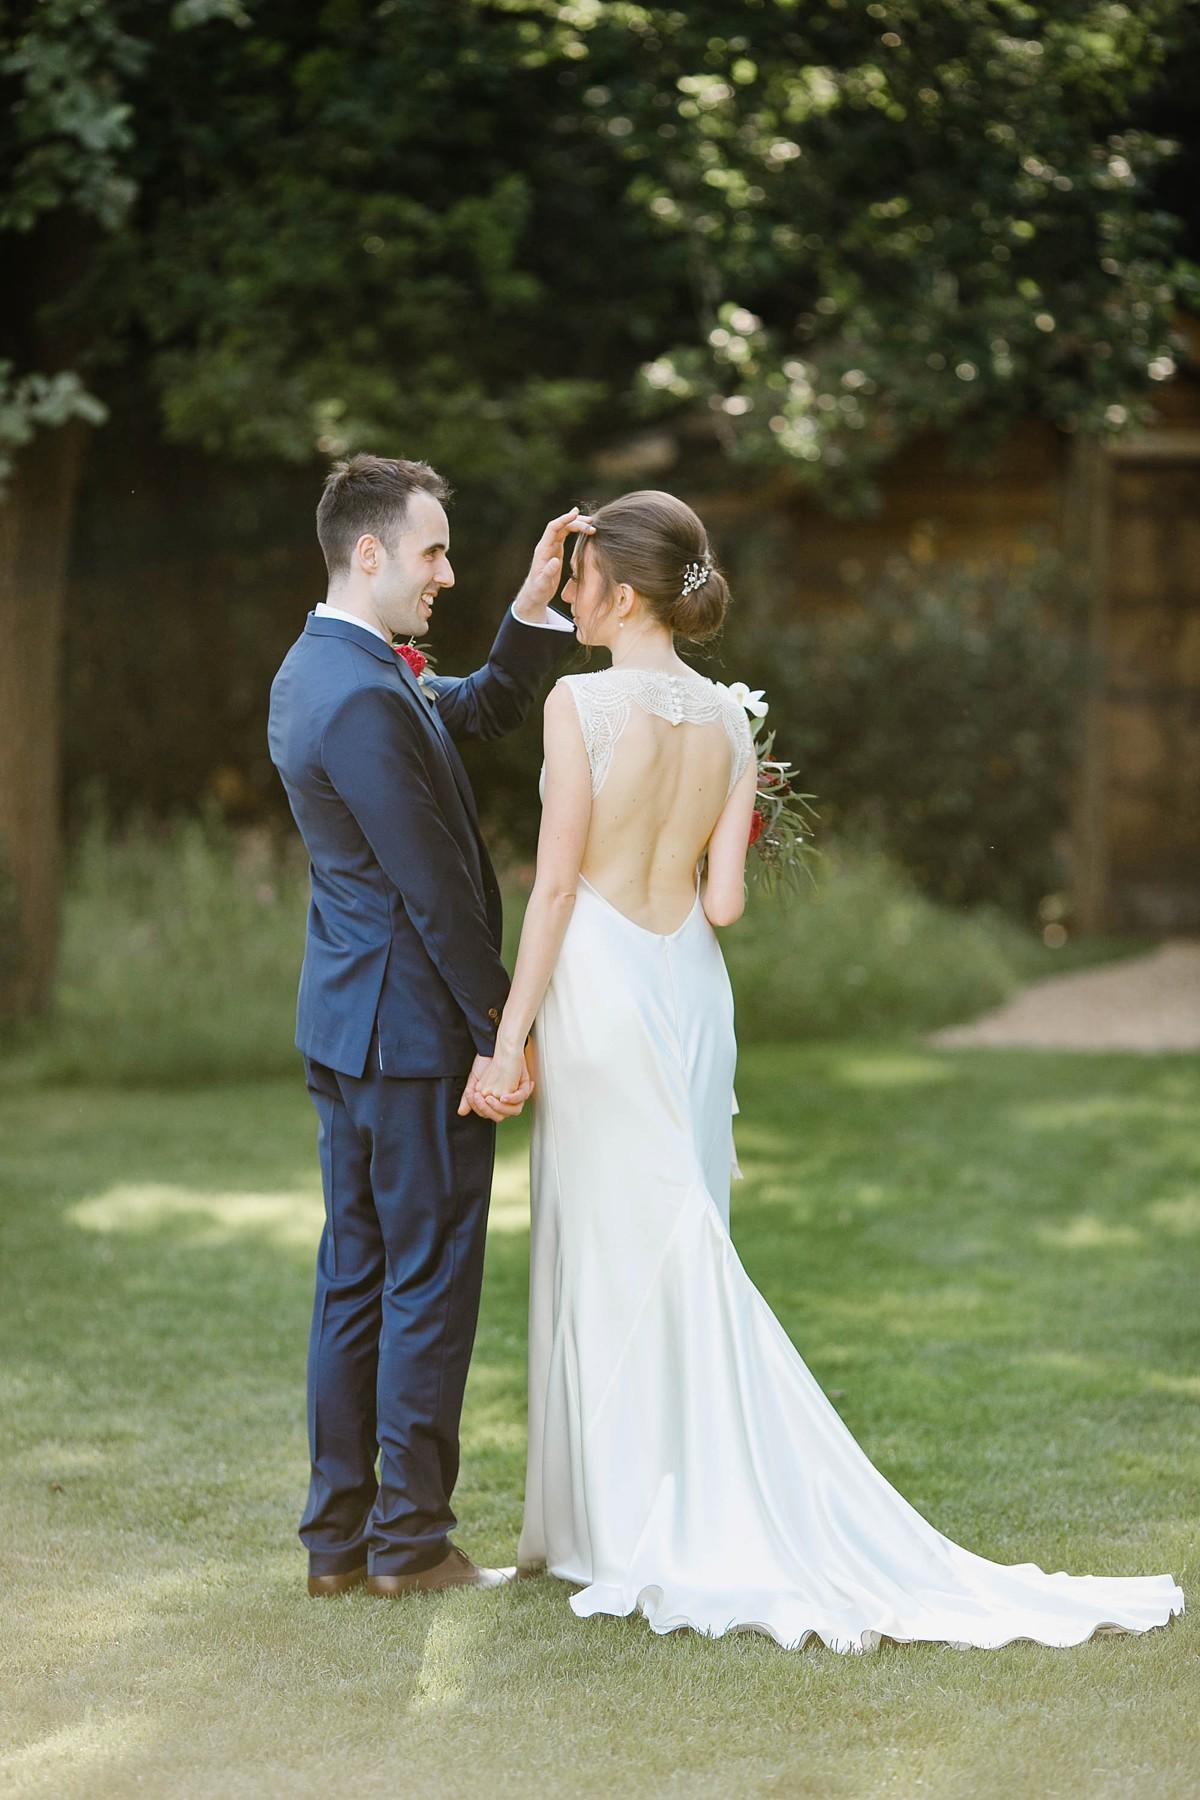 90ca250a7783 ... Suzanne Neville backless dress Millbridge Court wedding - A Backless  Gown by Suzanne Neville for a ...